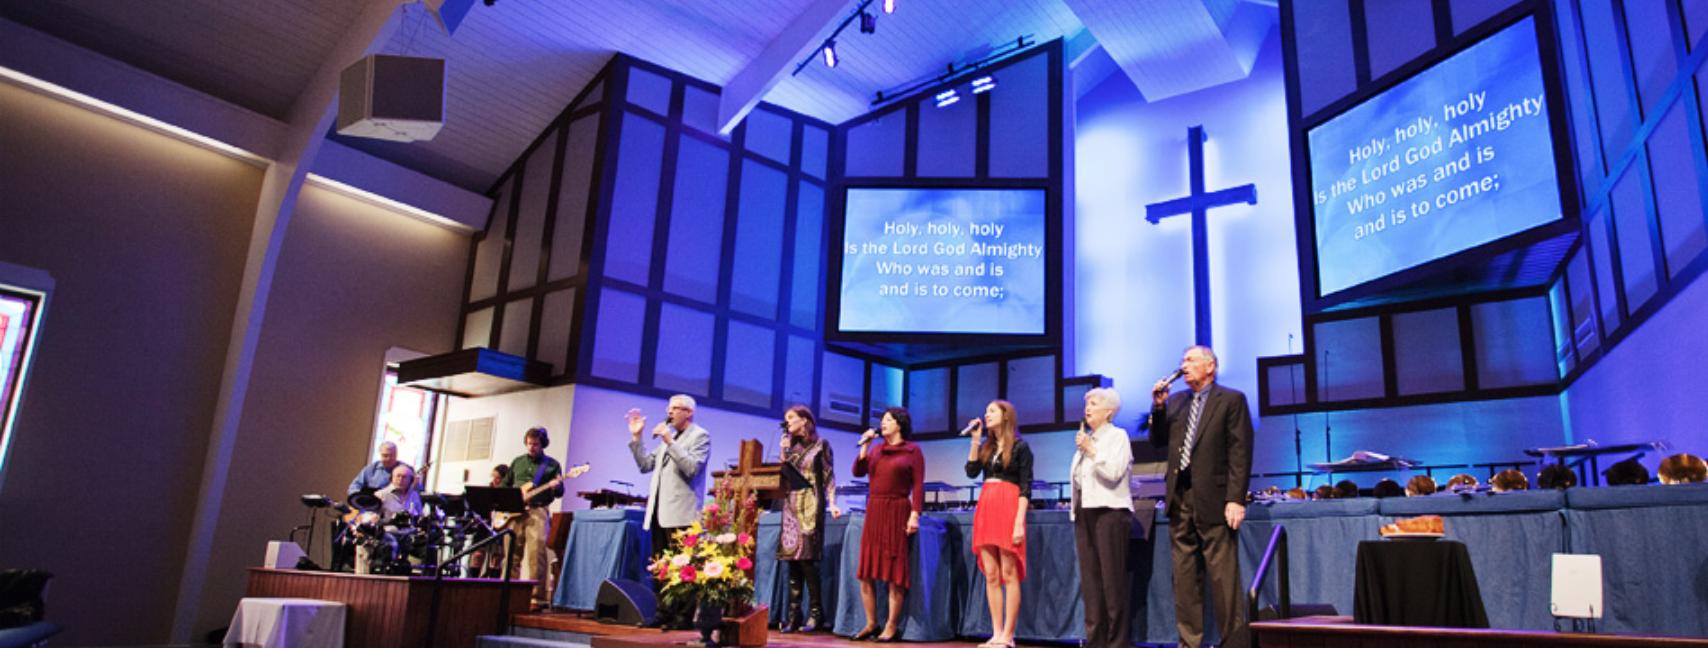 Trinity Baptist Church Sound System Upgrade